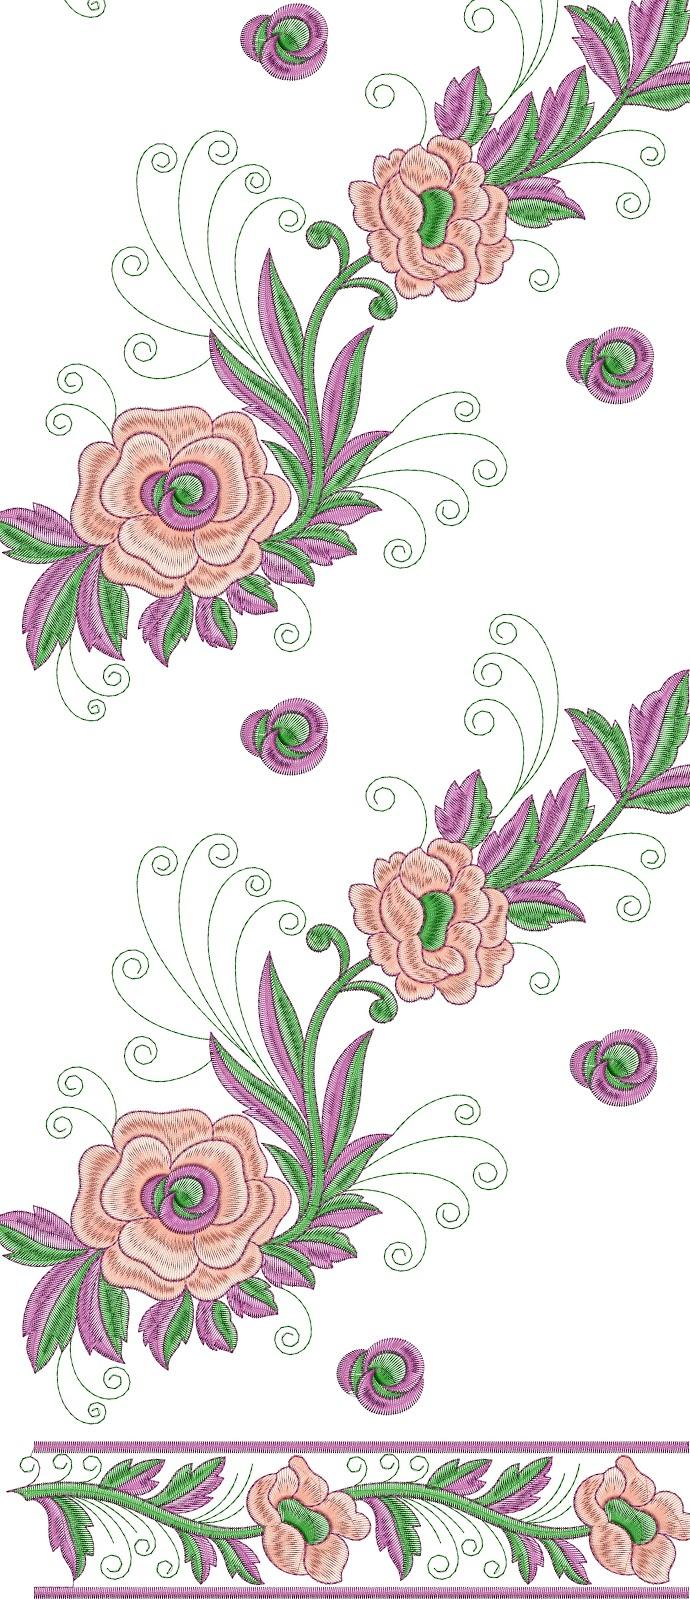 Embdesigntube Punjabi Dupatta Embroidery Design Free Download